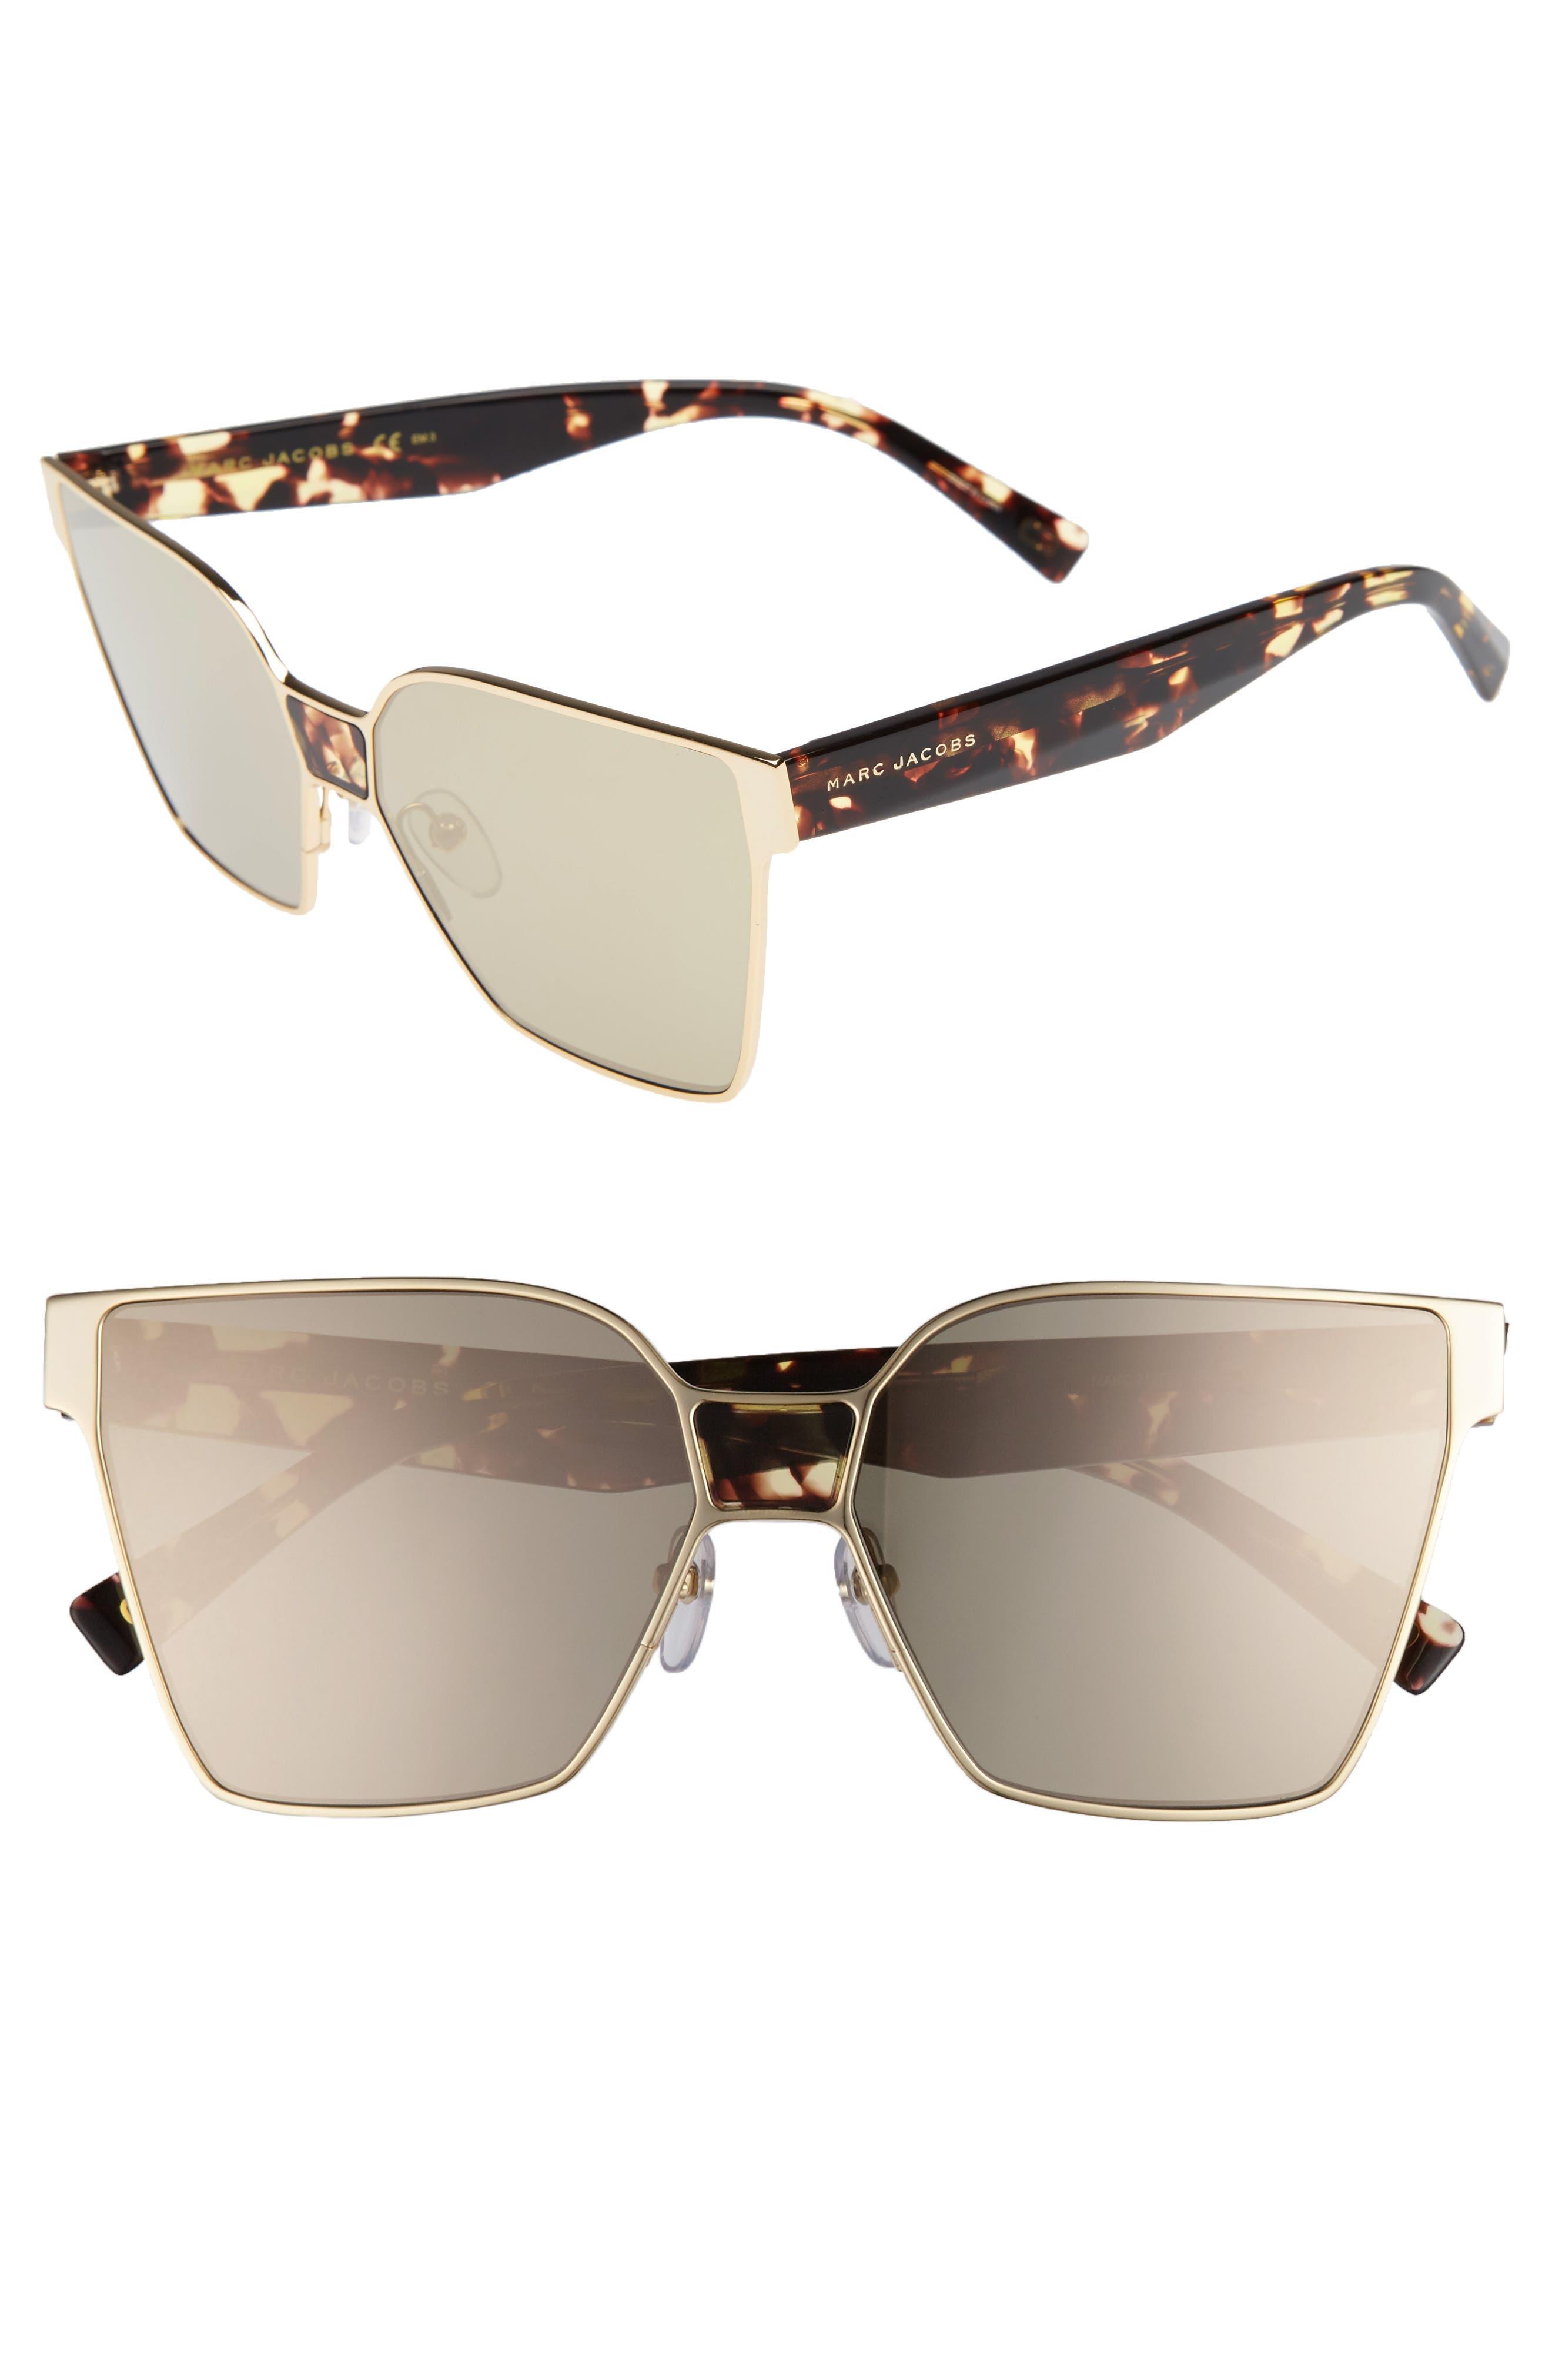 60mm Square Sunglasses,                         Main,                         color, Gold